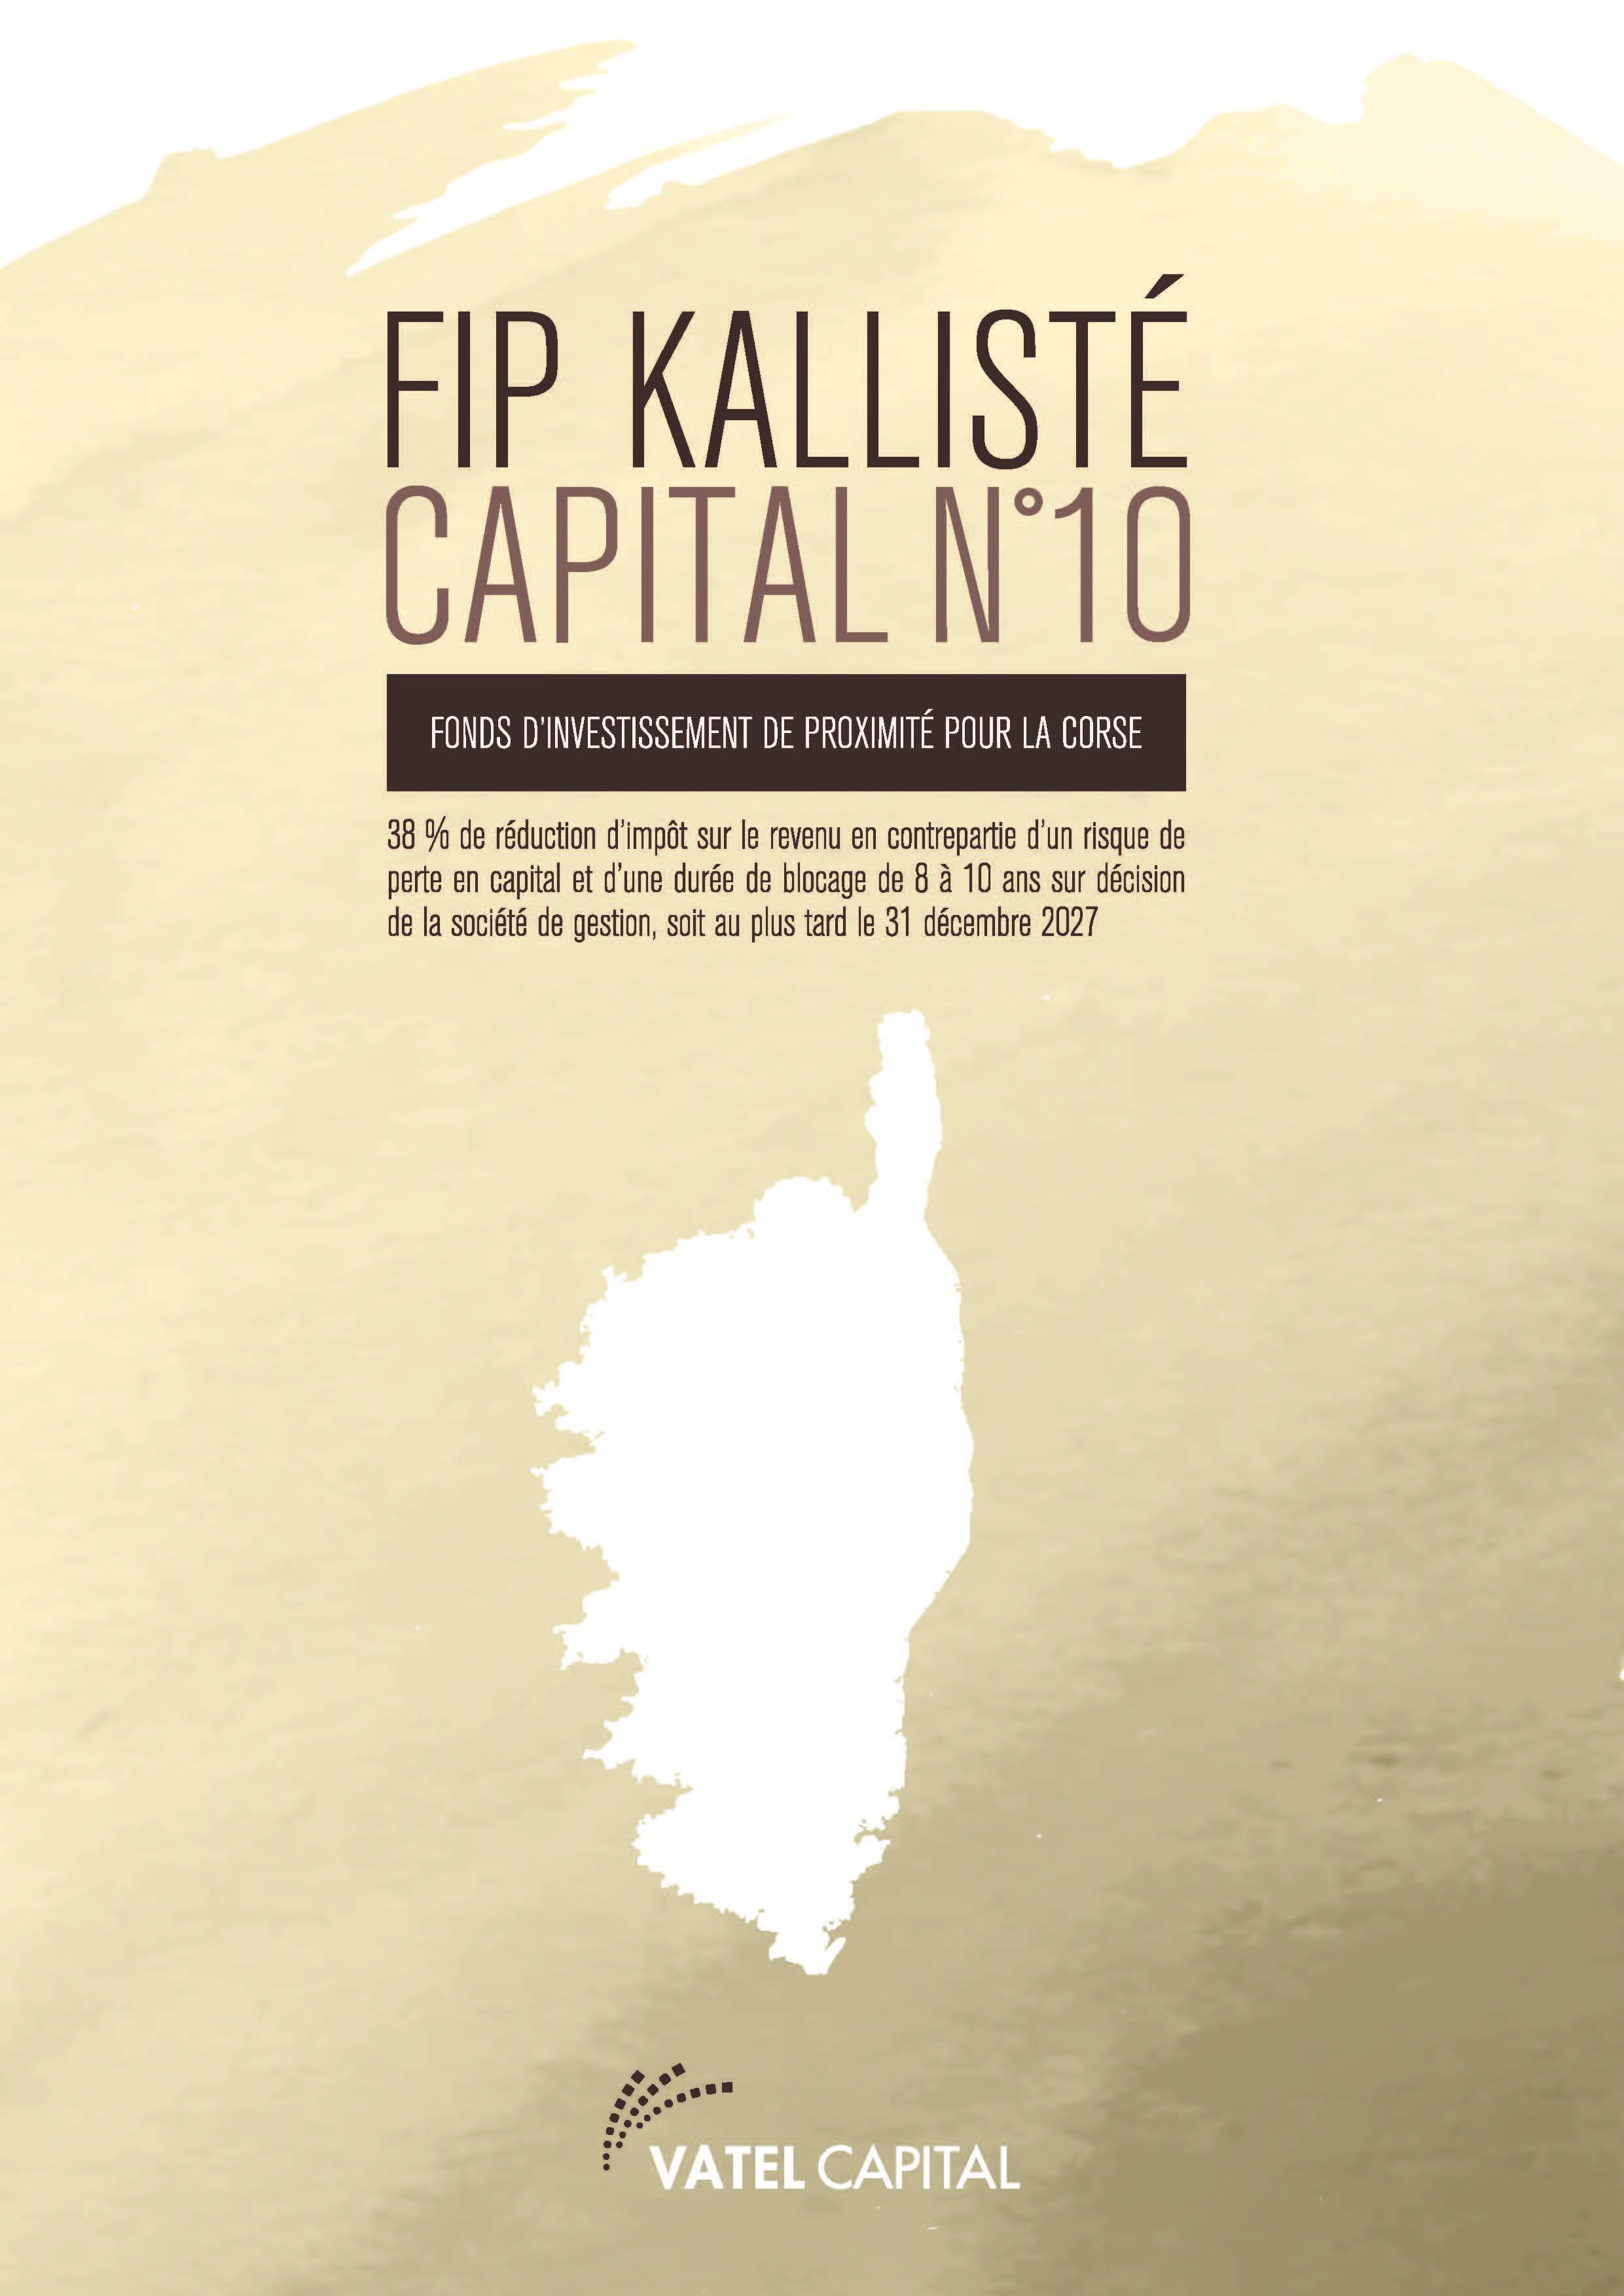 FIP KALLISTE CAPITAL N° 10